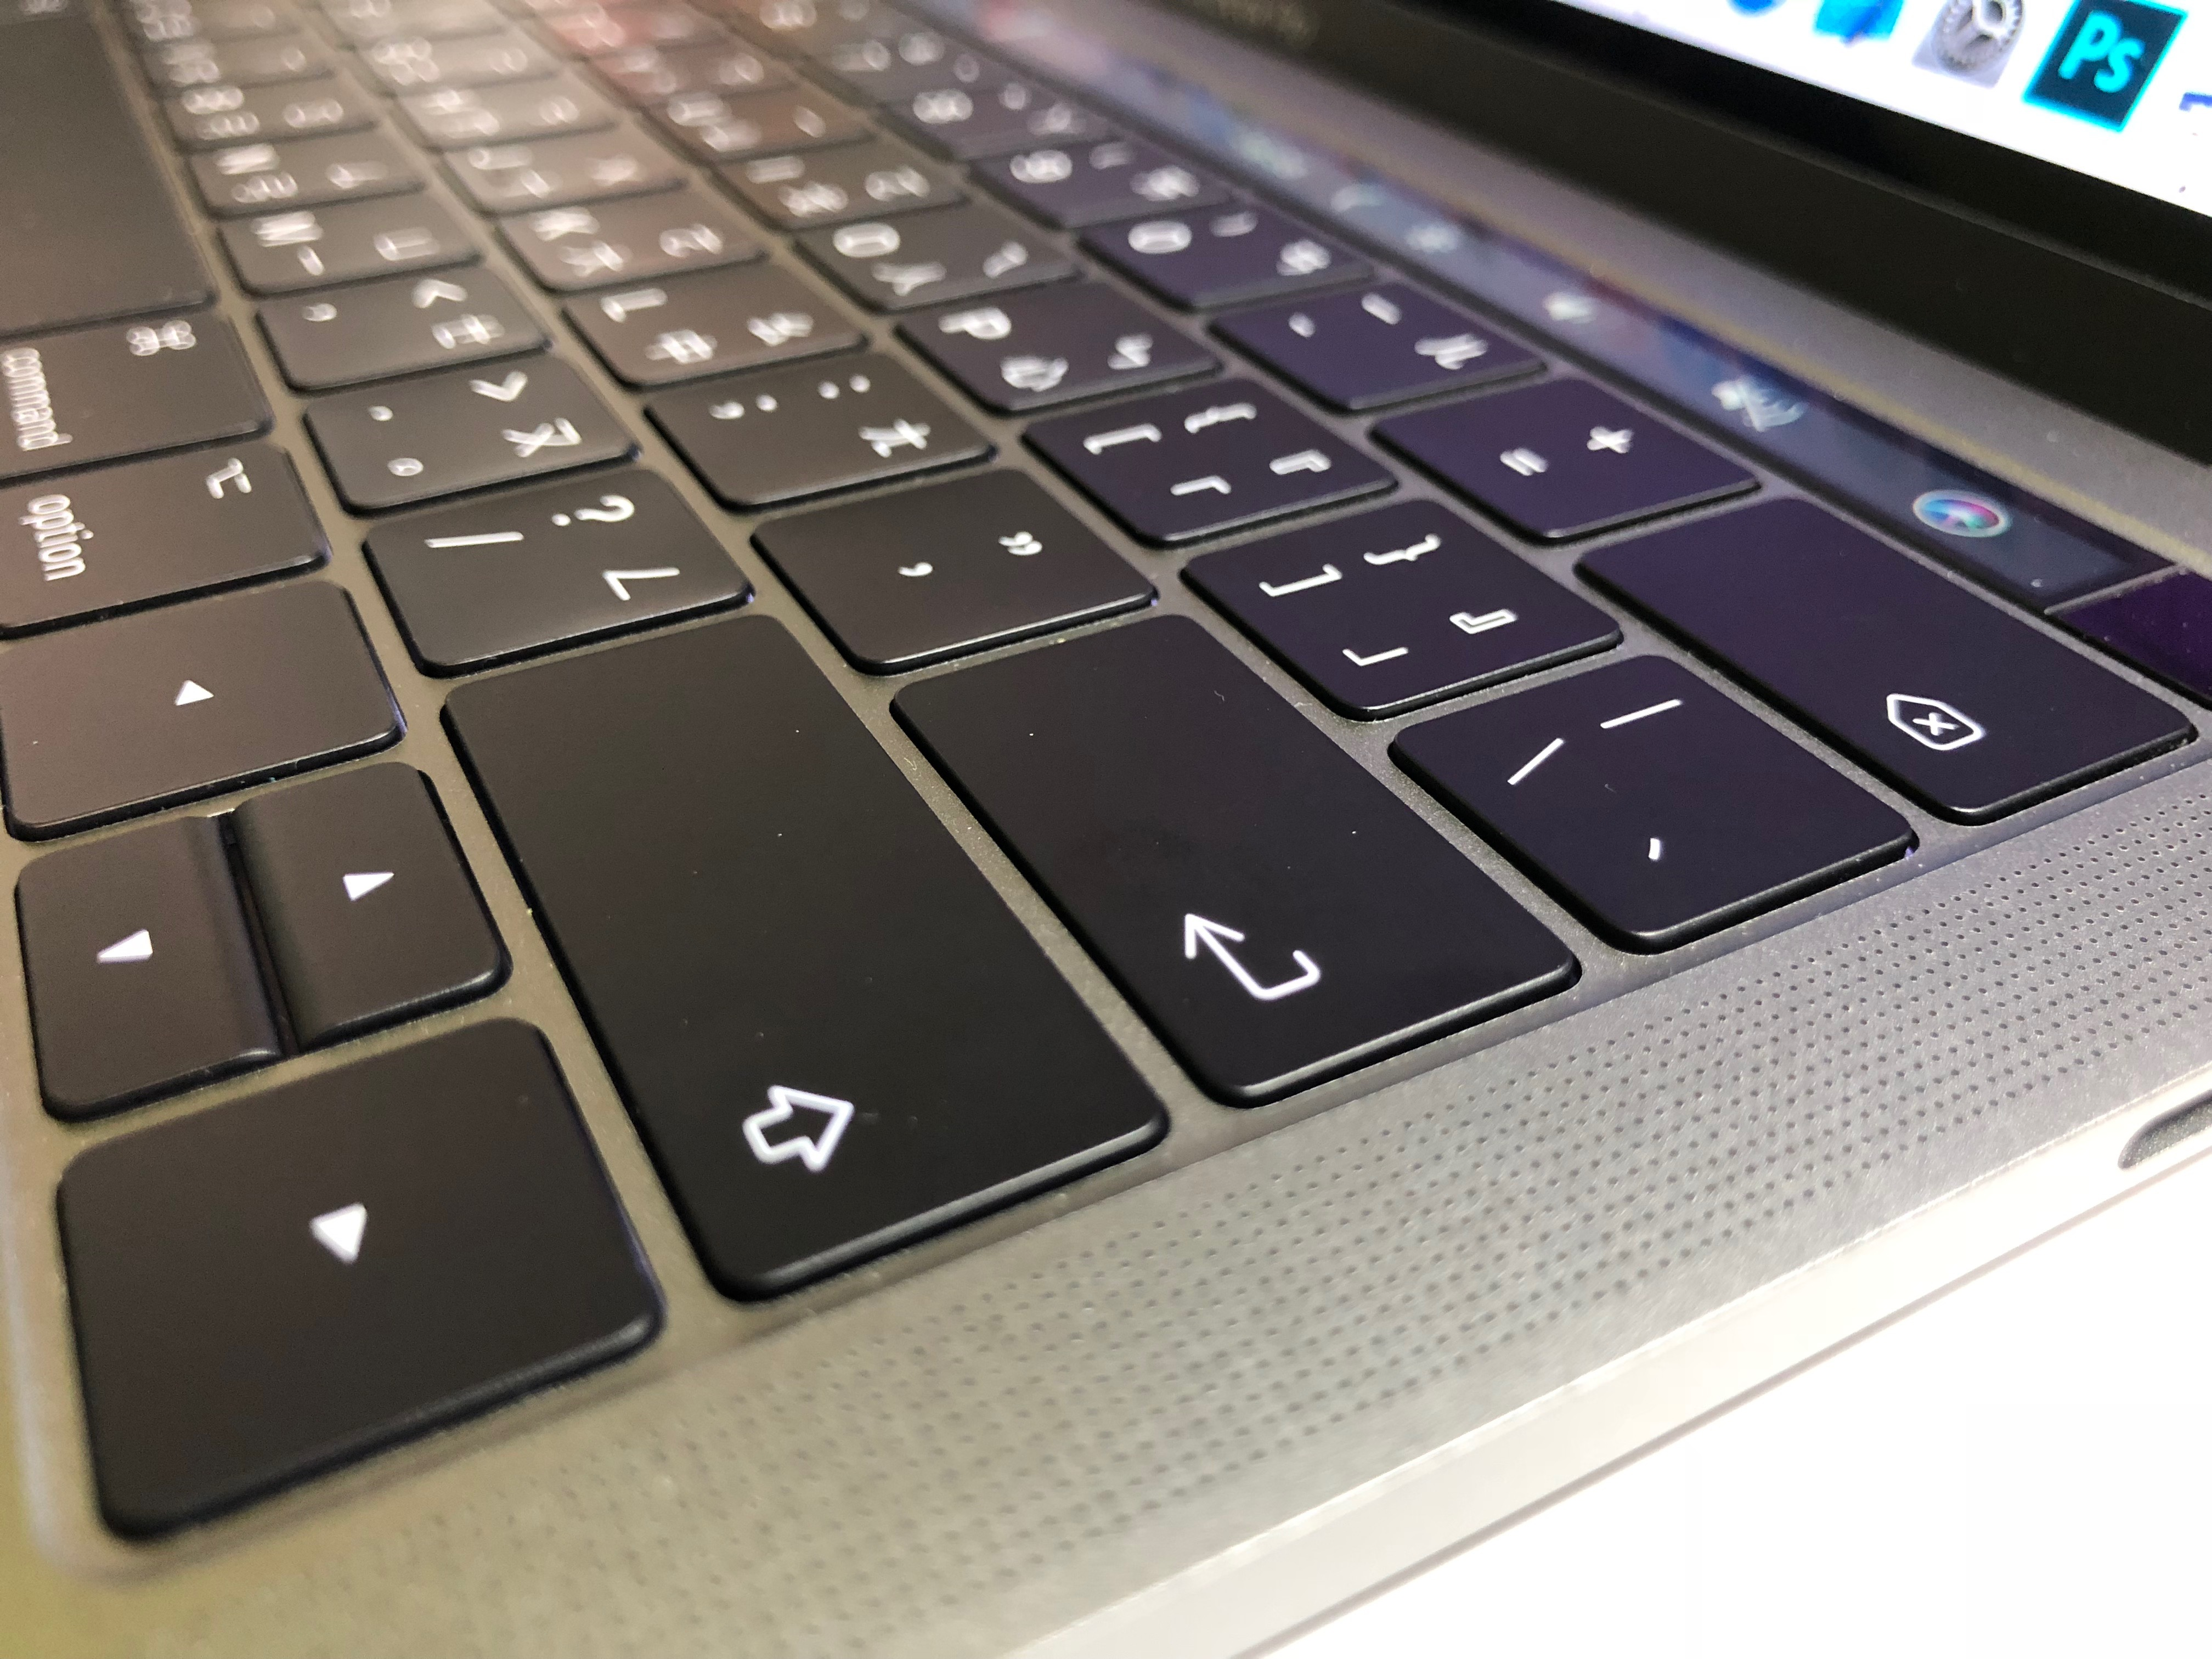 MacBook Pro 鍵盤故障送修過程-維修後鍵盤